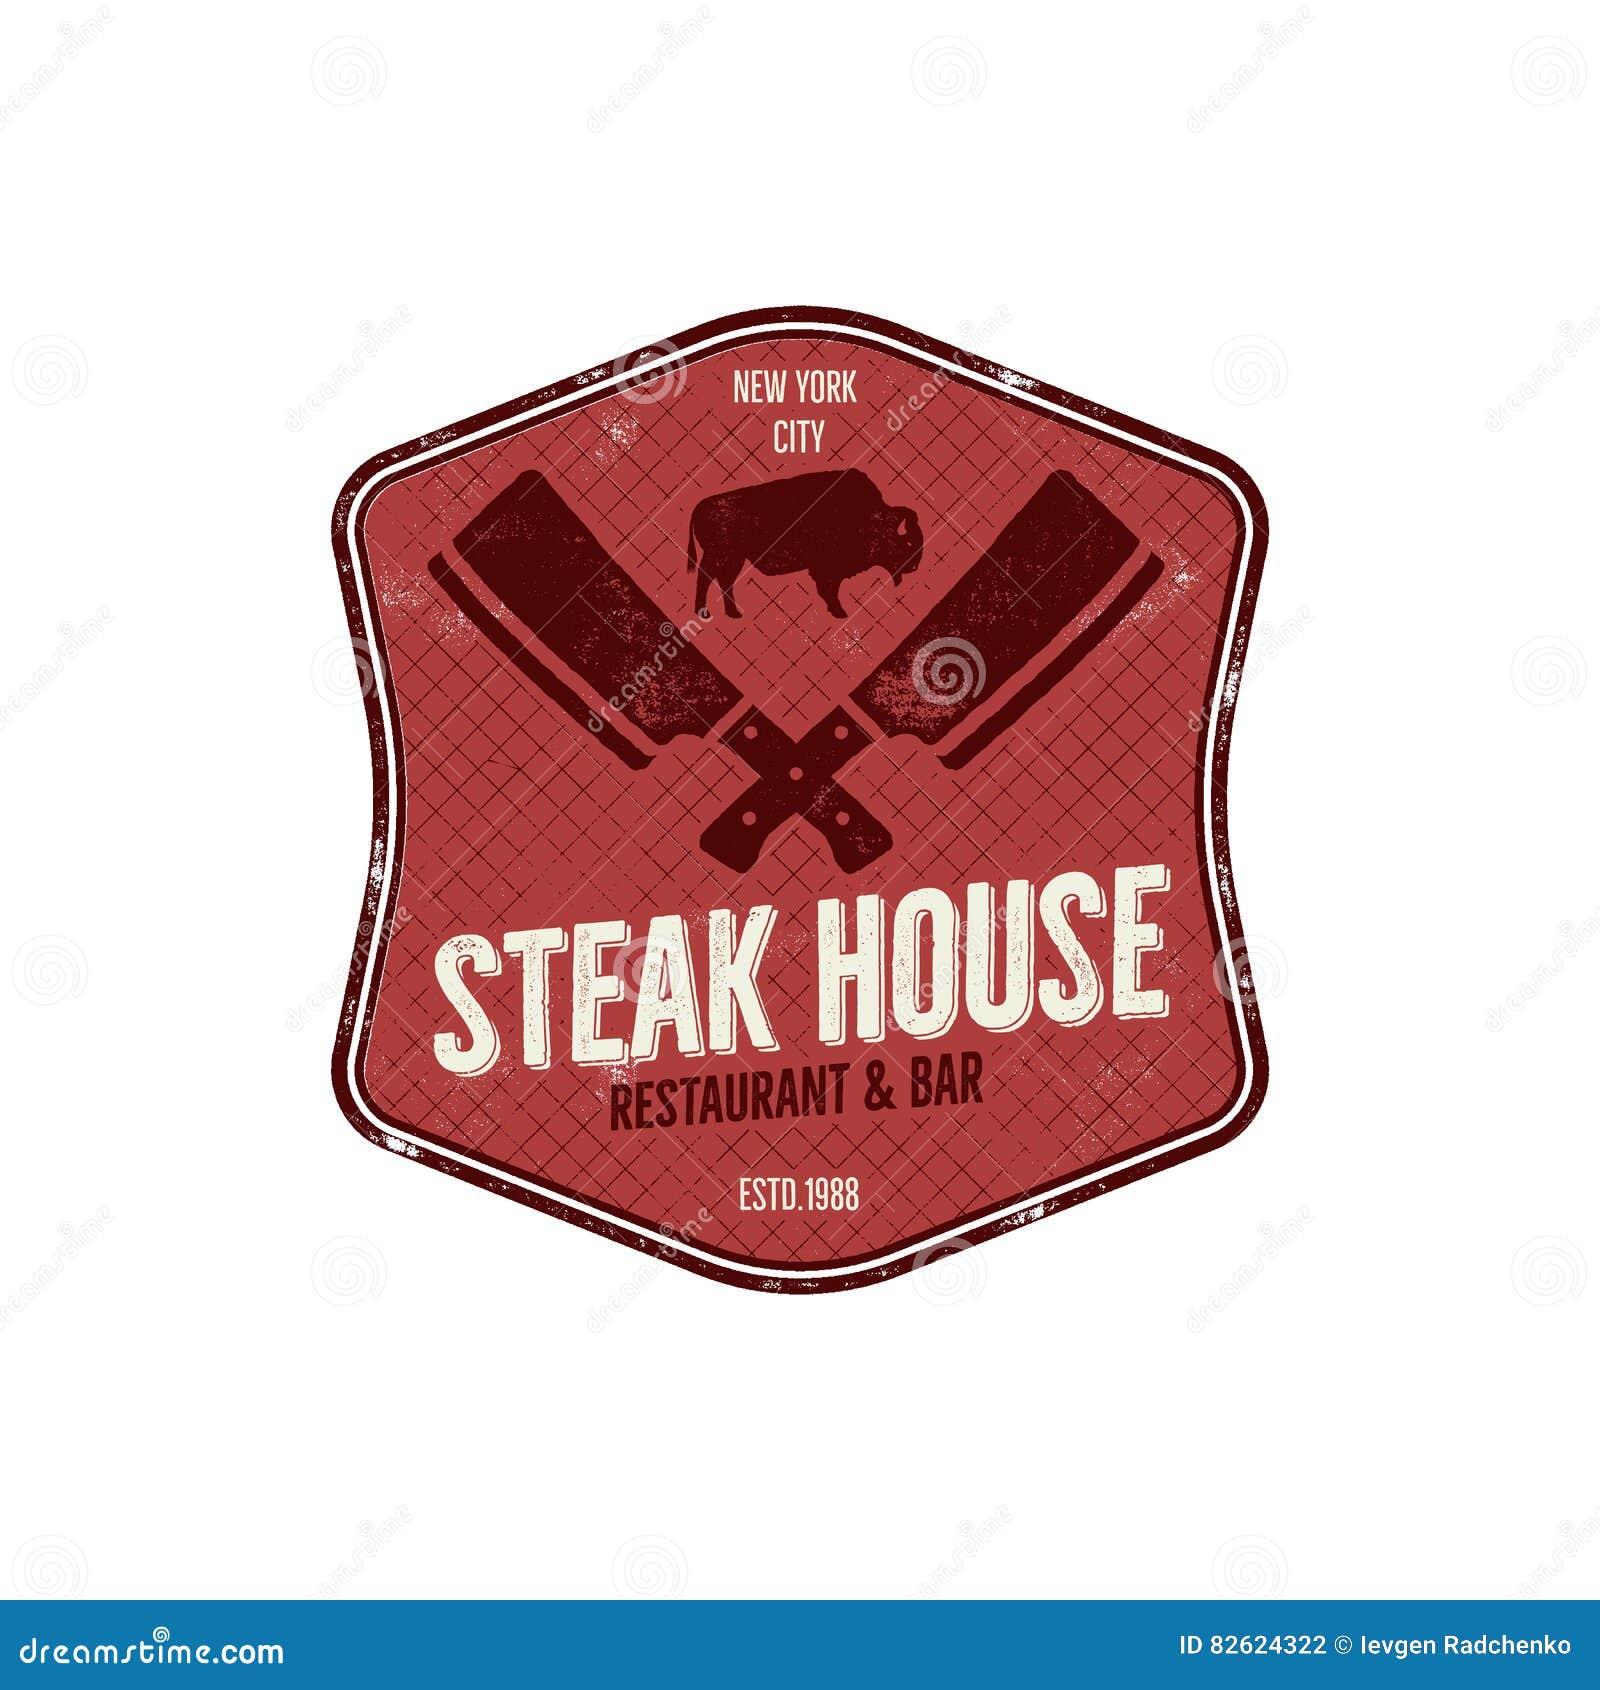 Steak House vintage Label. Typography letterpress design. Vector steak house retro logo. Included bbq grill symbols for